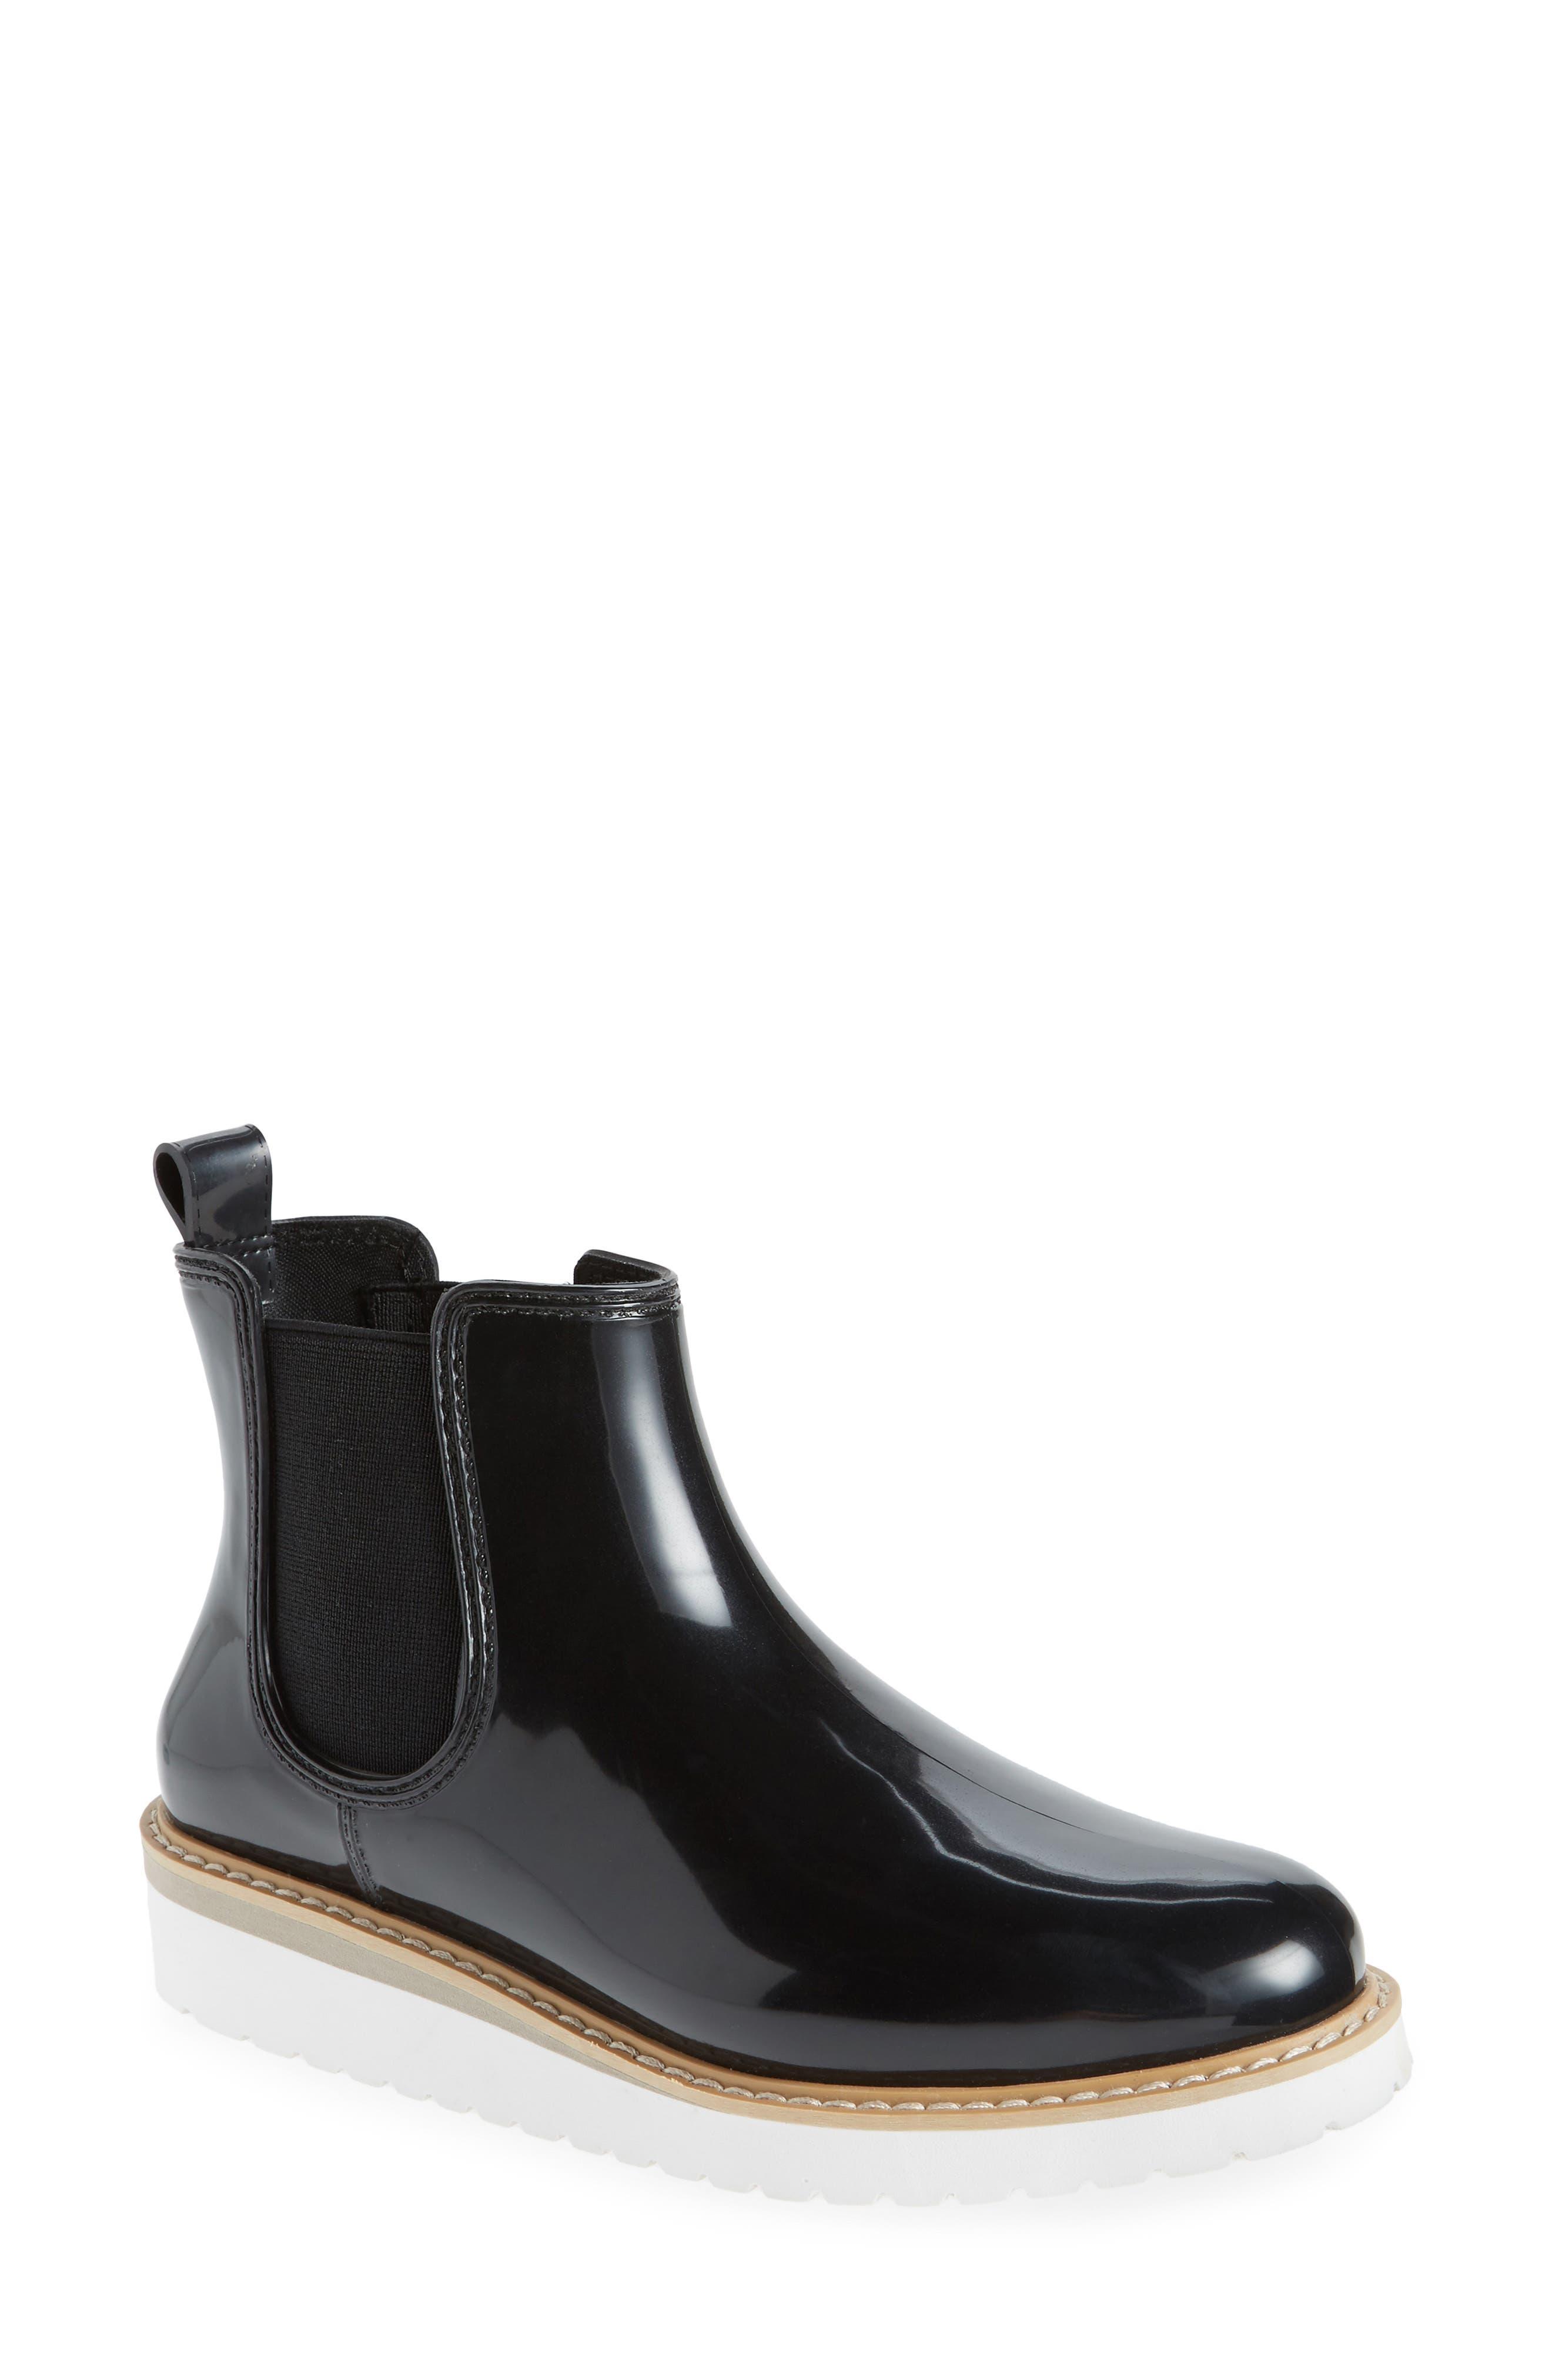 Kensington Chelsea Rain Boot,                         Main,                         color, BLACK/ WHITE